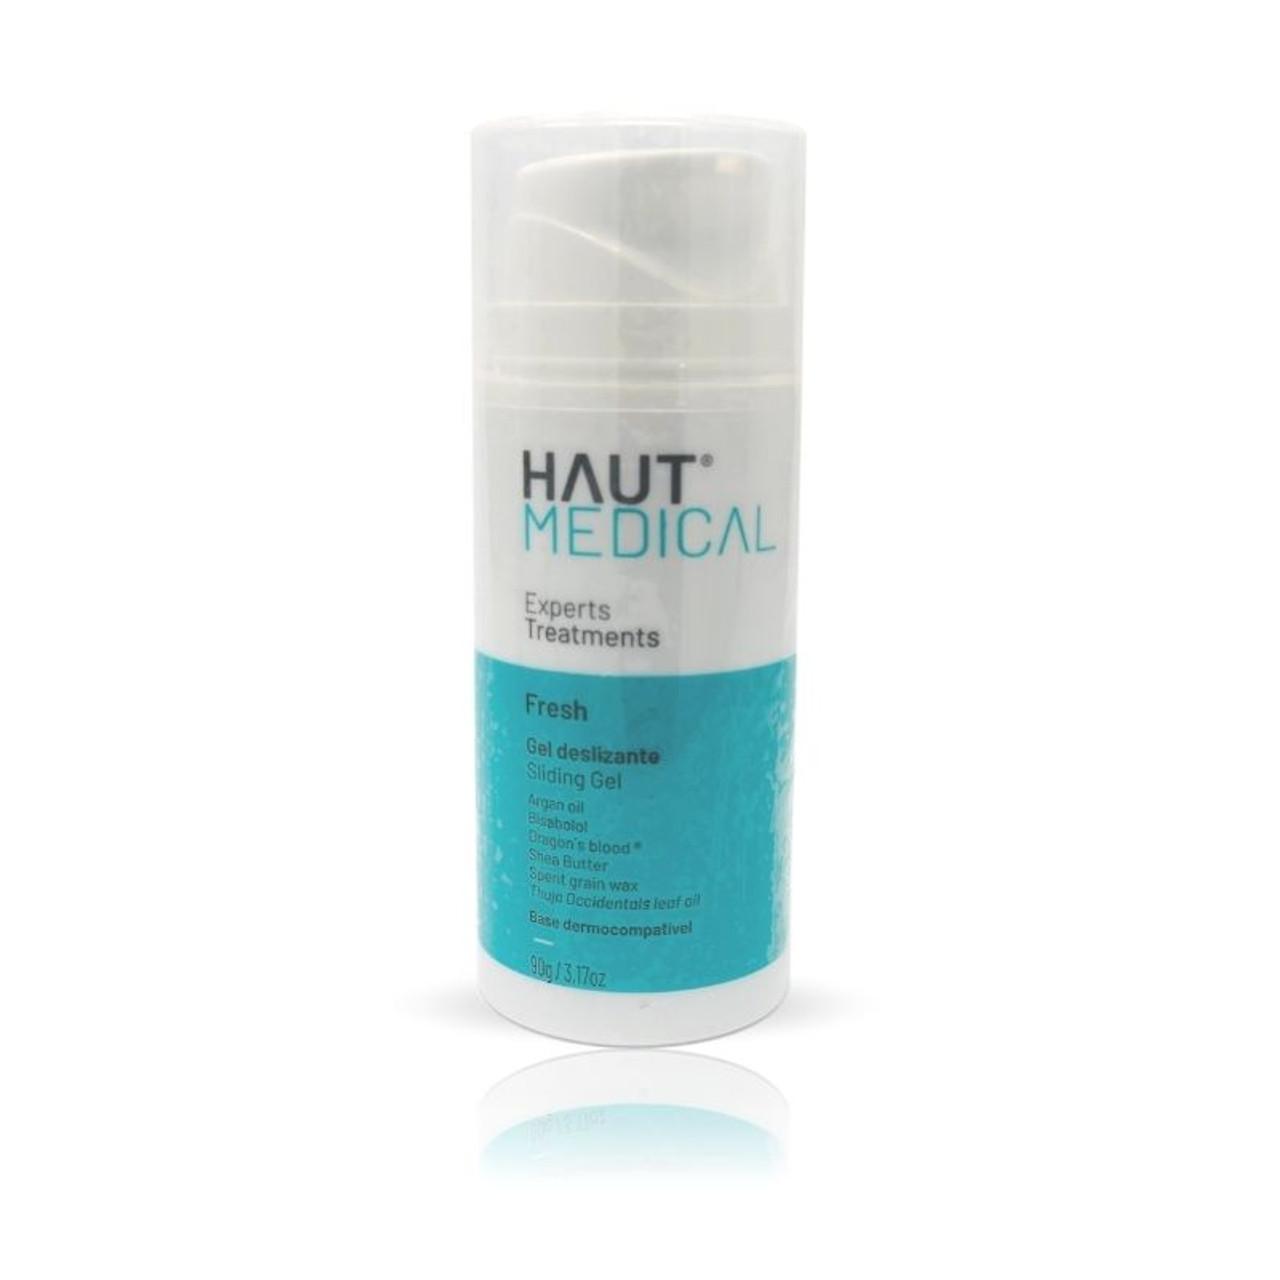 Haut Medical Fresh Sliding Gel - Permanent Makeup (PMU) and Body Tattooing - 90g/3.17oz